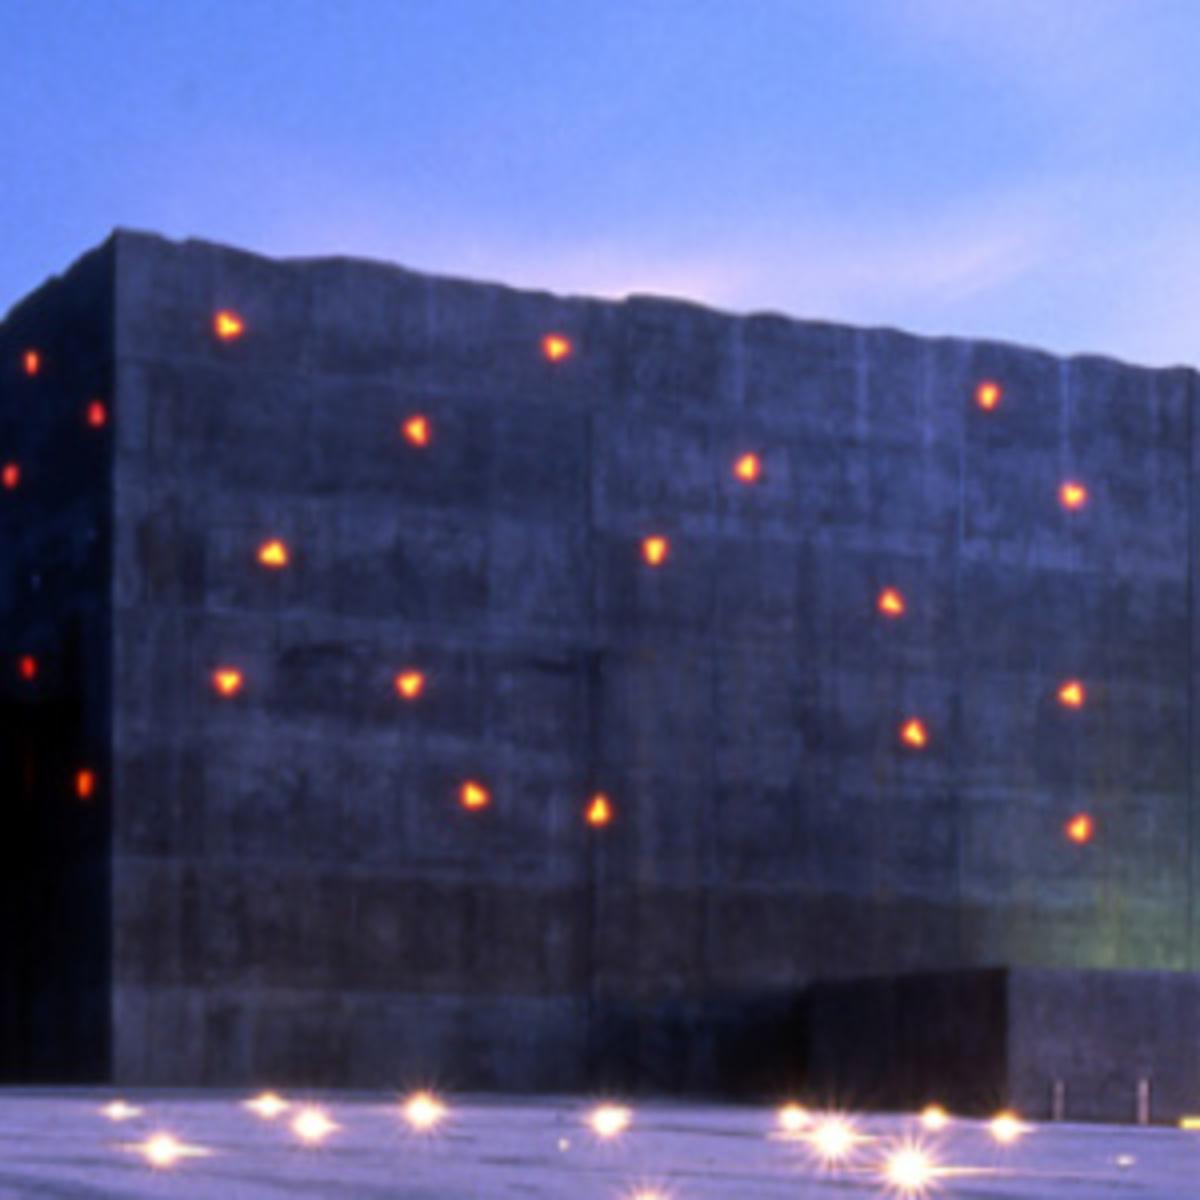 Concert Stadium Vitrolles France Rudy Ricciotti 2000 Floornature